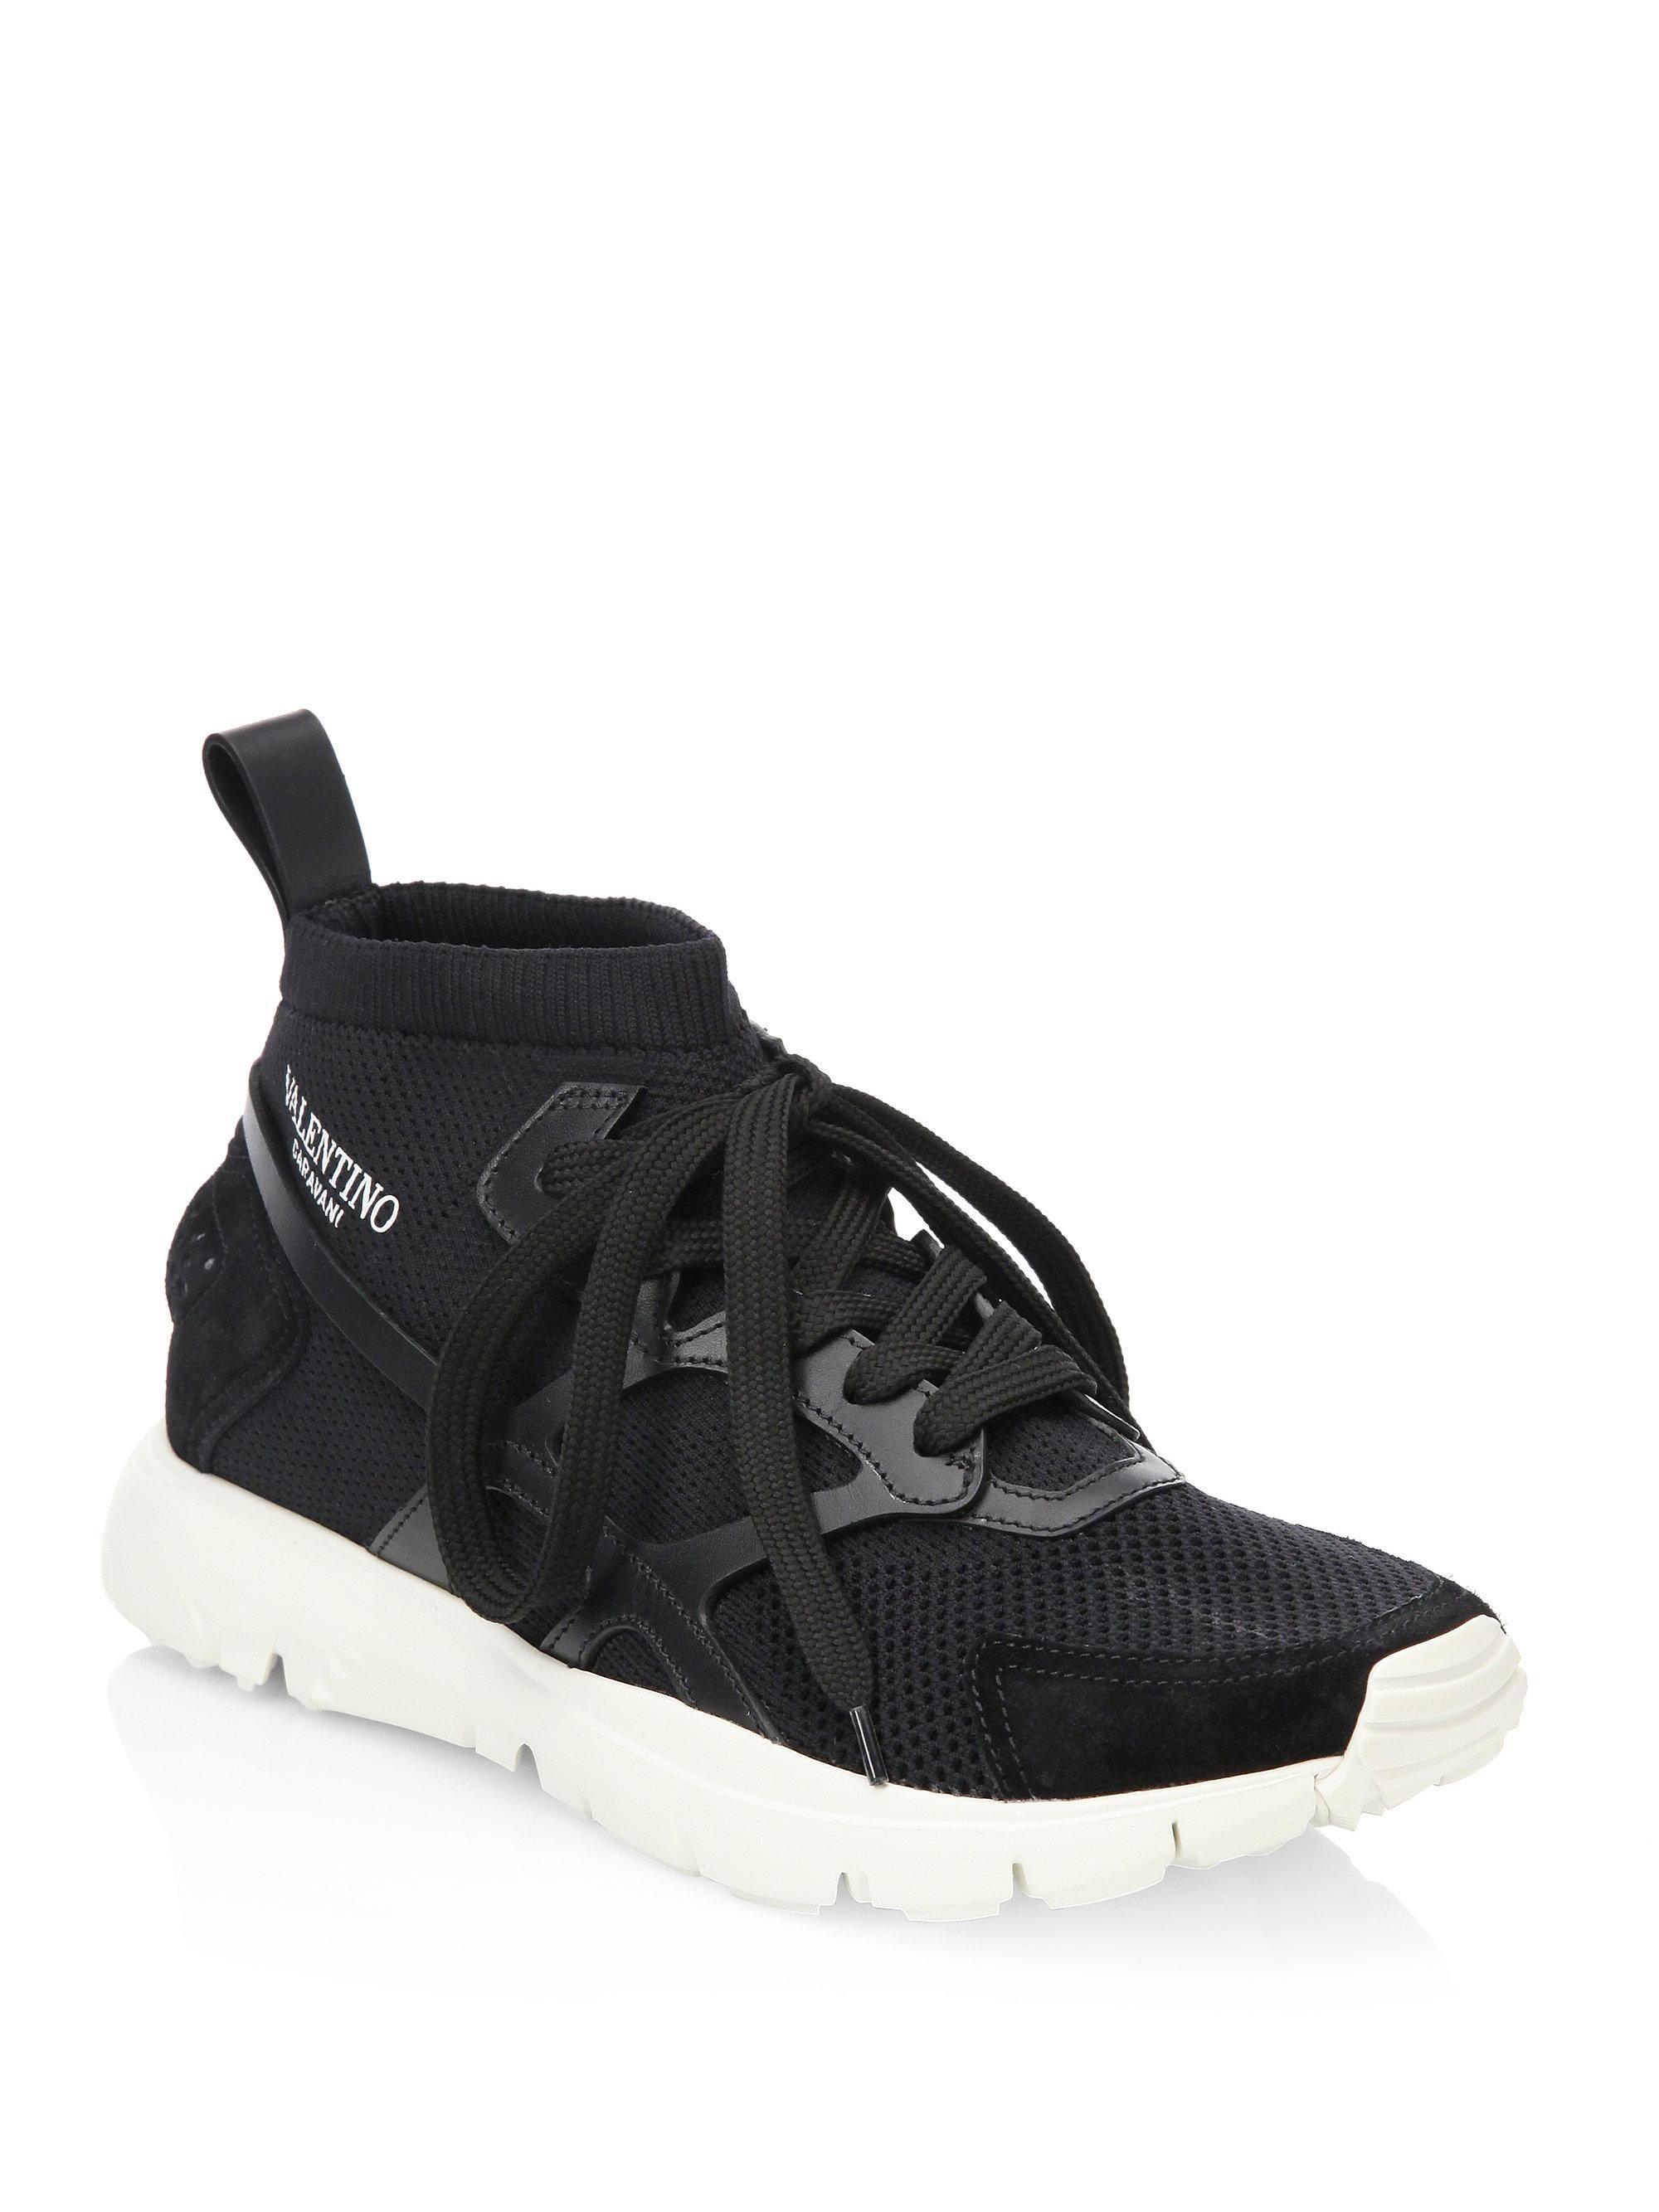 ValentinoMesh Low Sock Sneakers 17yR28JsS